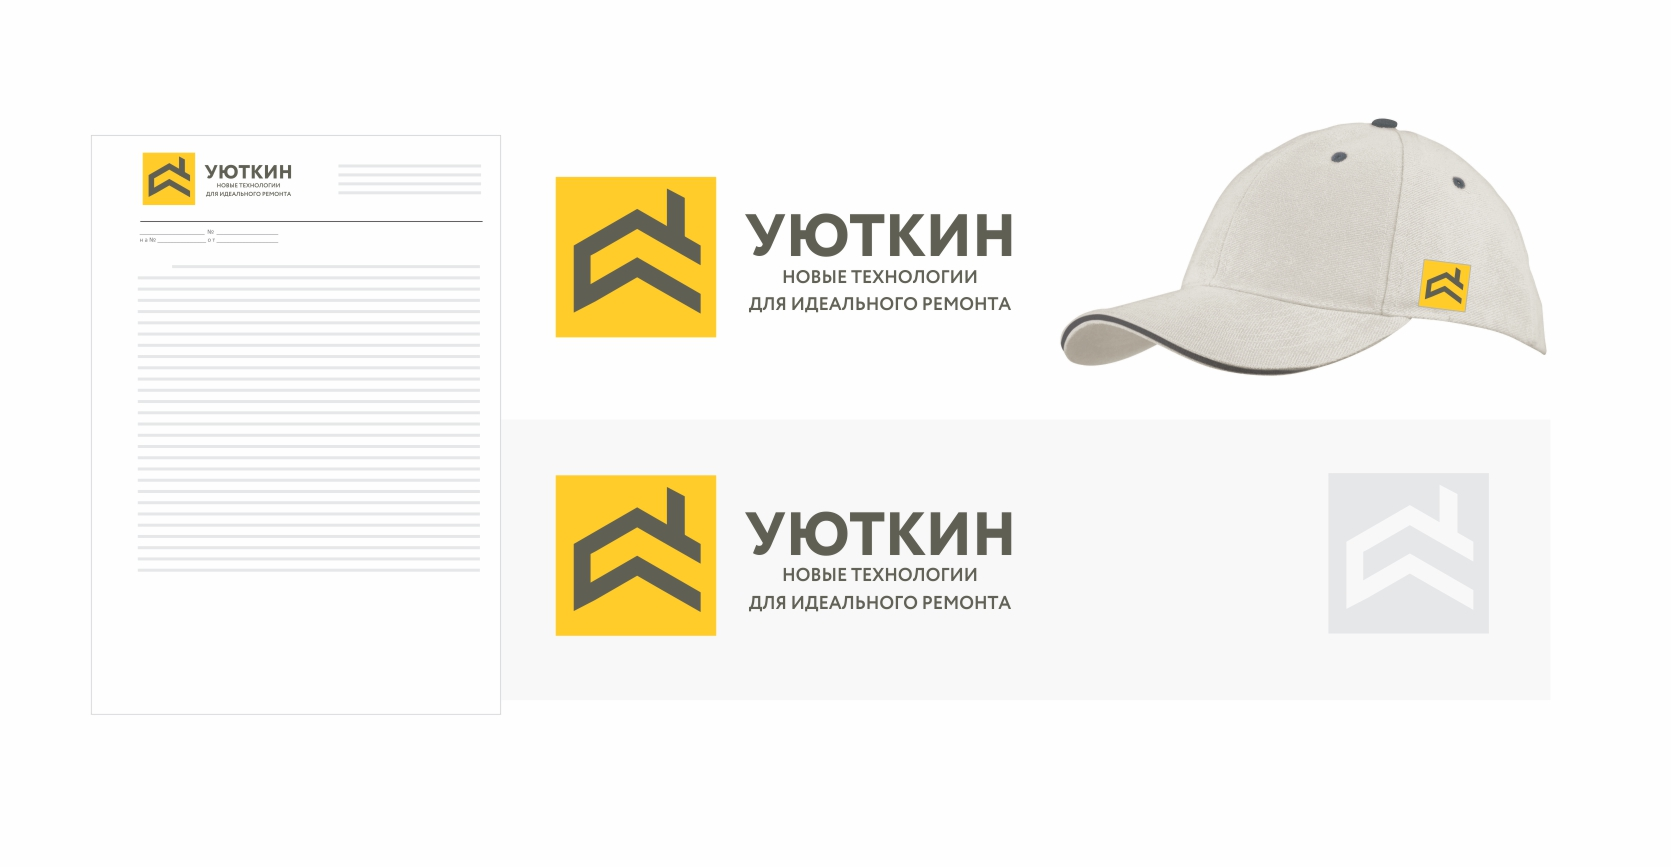 Создание логотипа и стиля сайта фото f_5125c61c41c5bab2.jpg